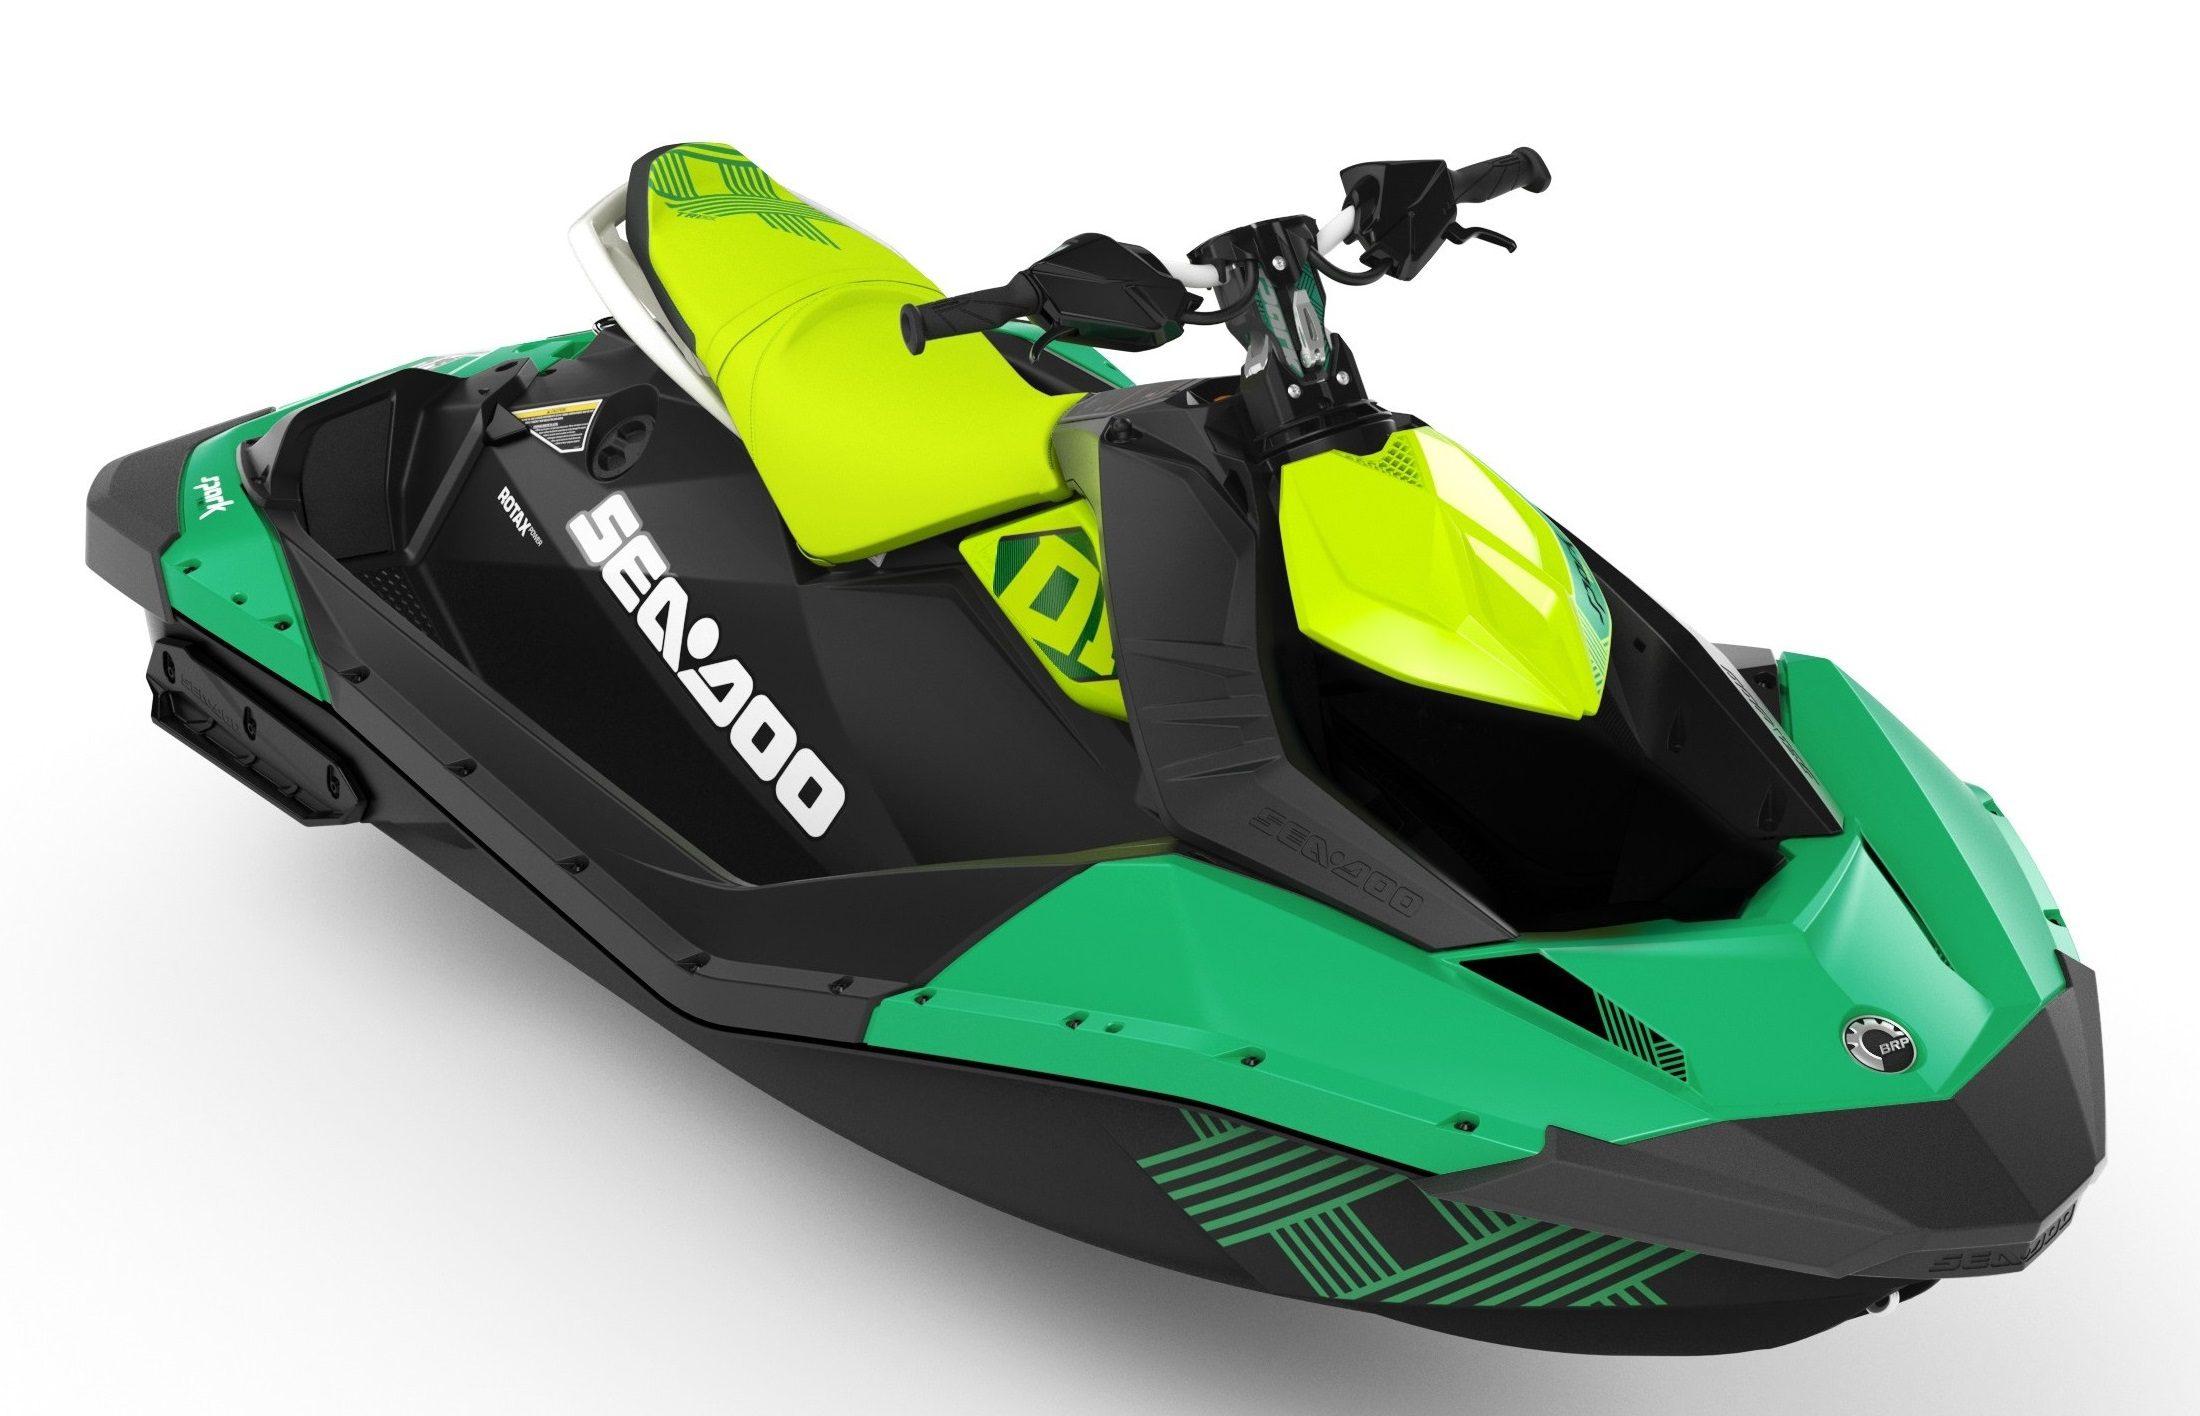 Sea-Doo SPARK IBR 2UP 90 TRIXX 2021